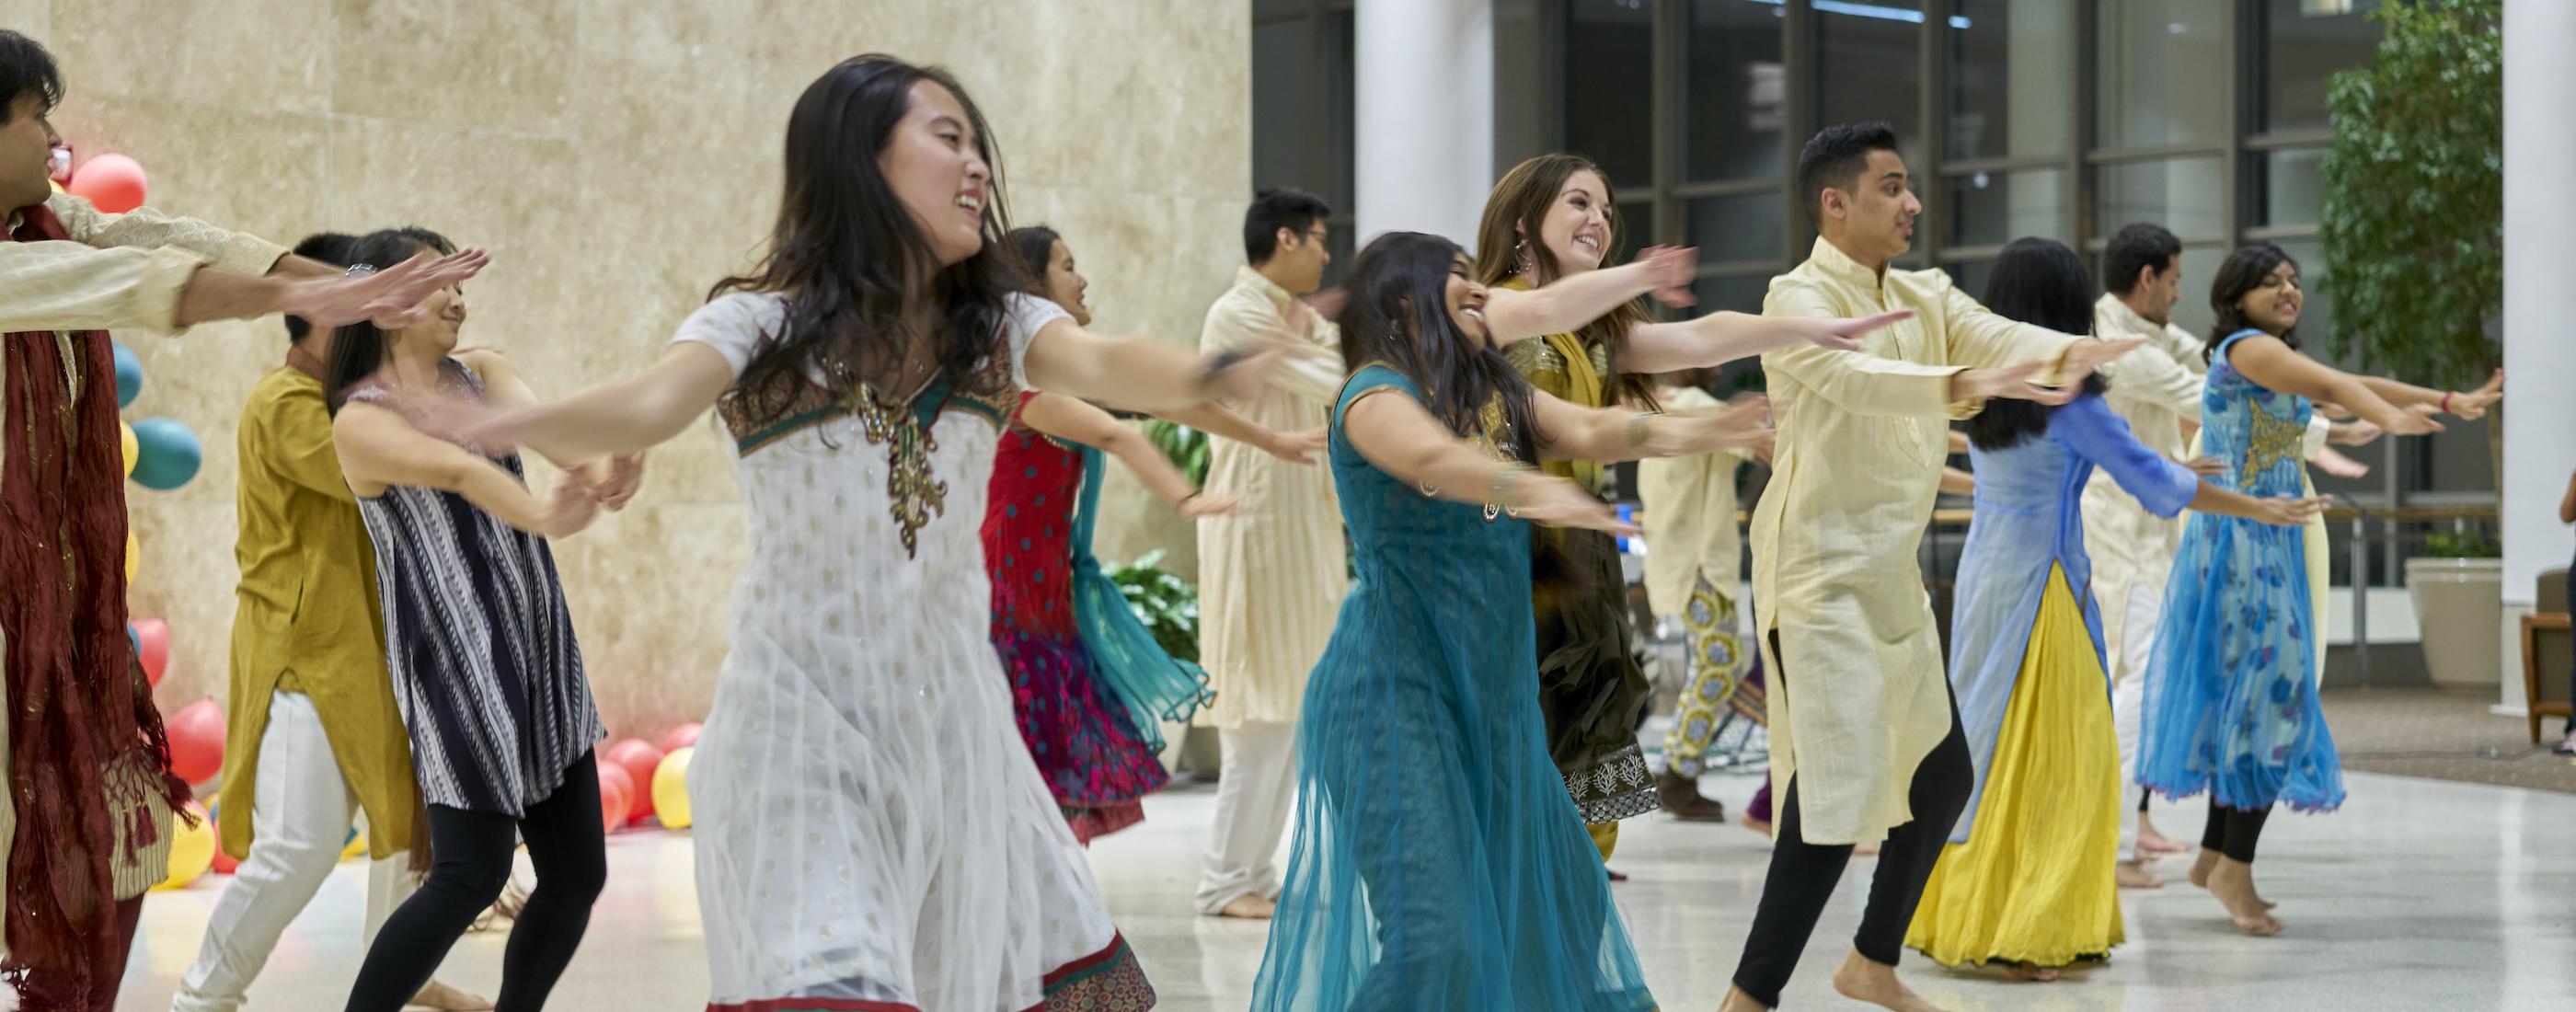 Students Dancing at Diwali